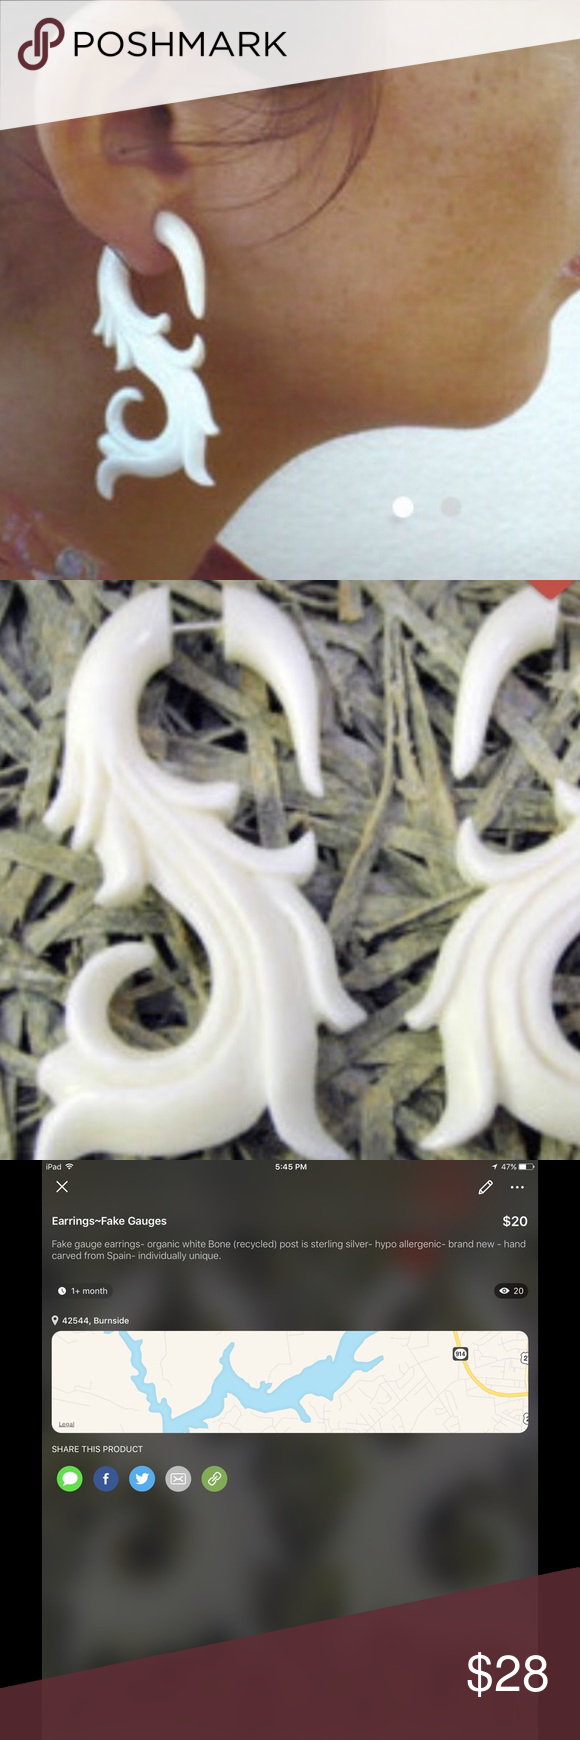 Fake gauge earringsorganic white bone recycled nwt gauges